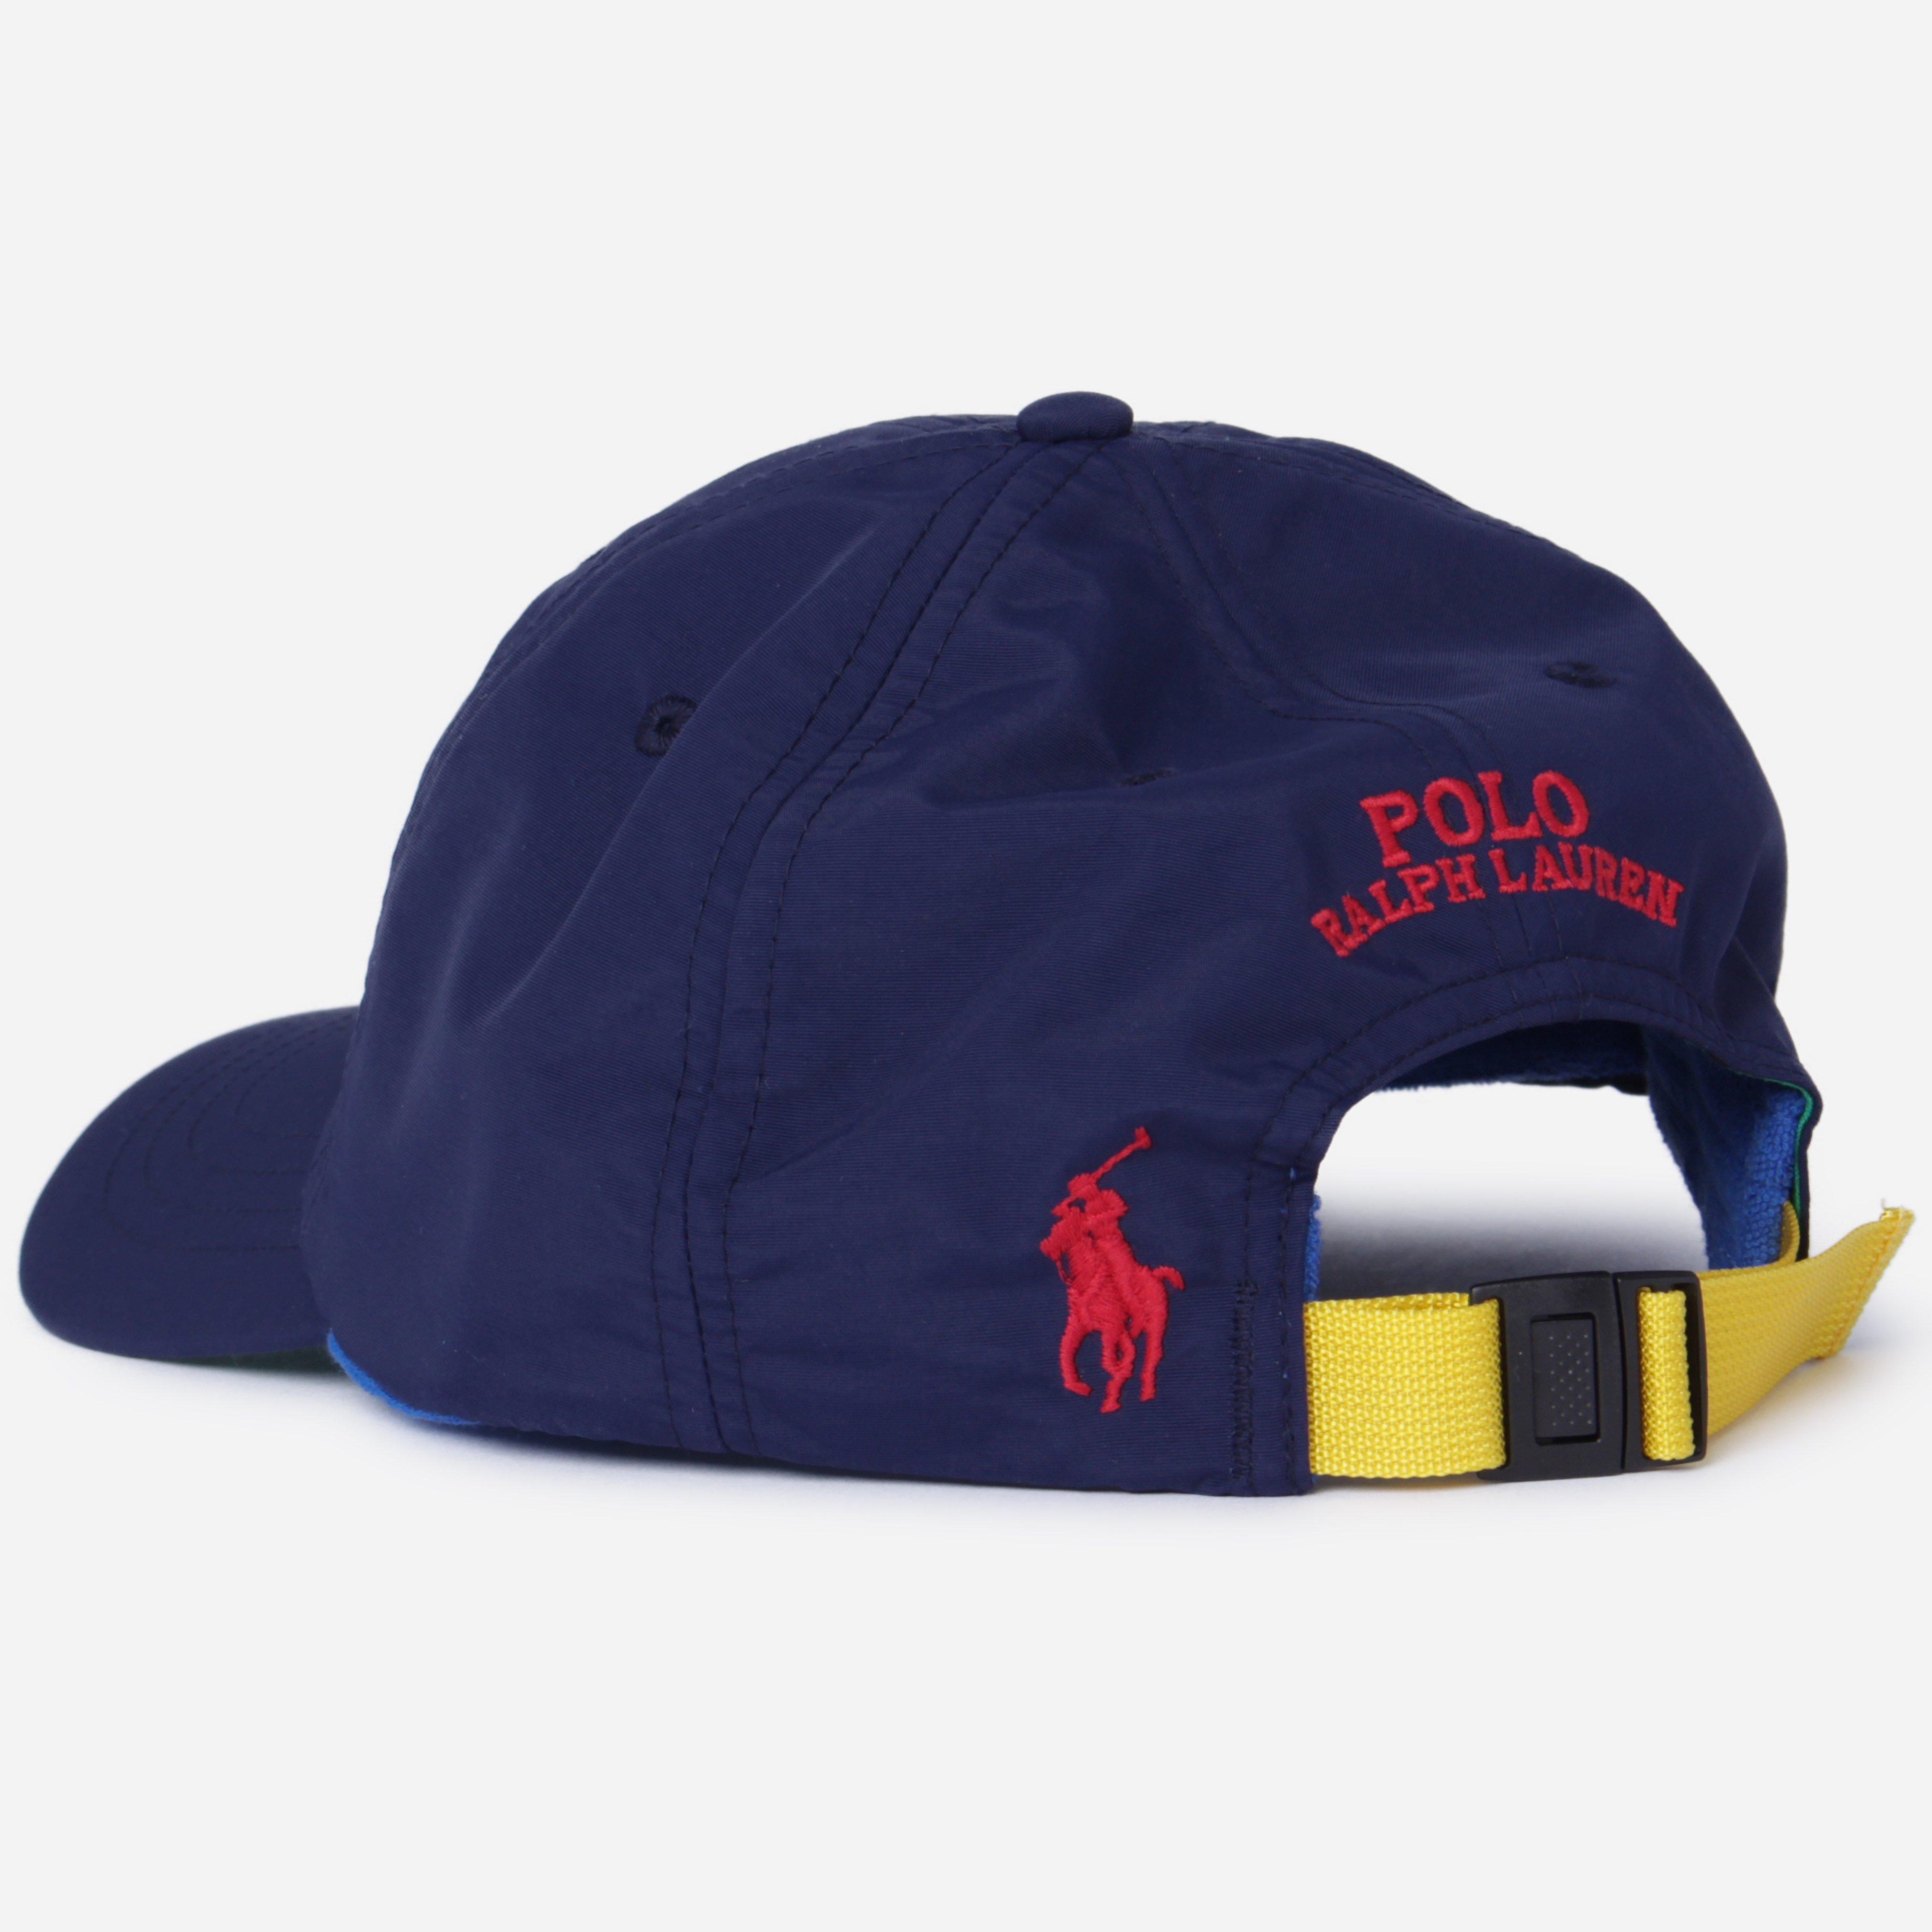 fd3c7fac0016e Polo Ralph Lauren - Blue Appliquéd Nylon Cap for Men - Lyst. View fullscreen